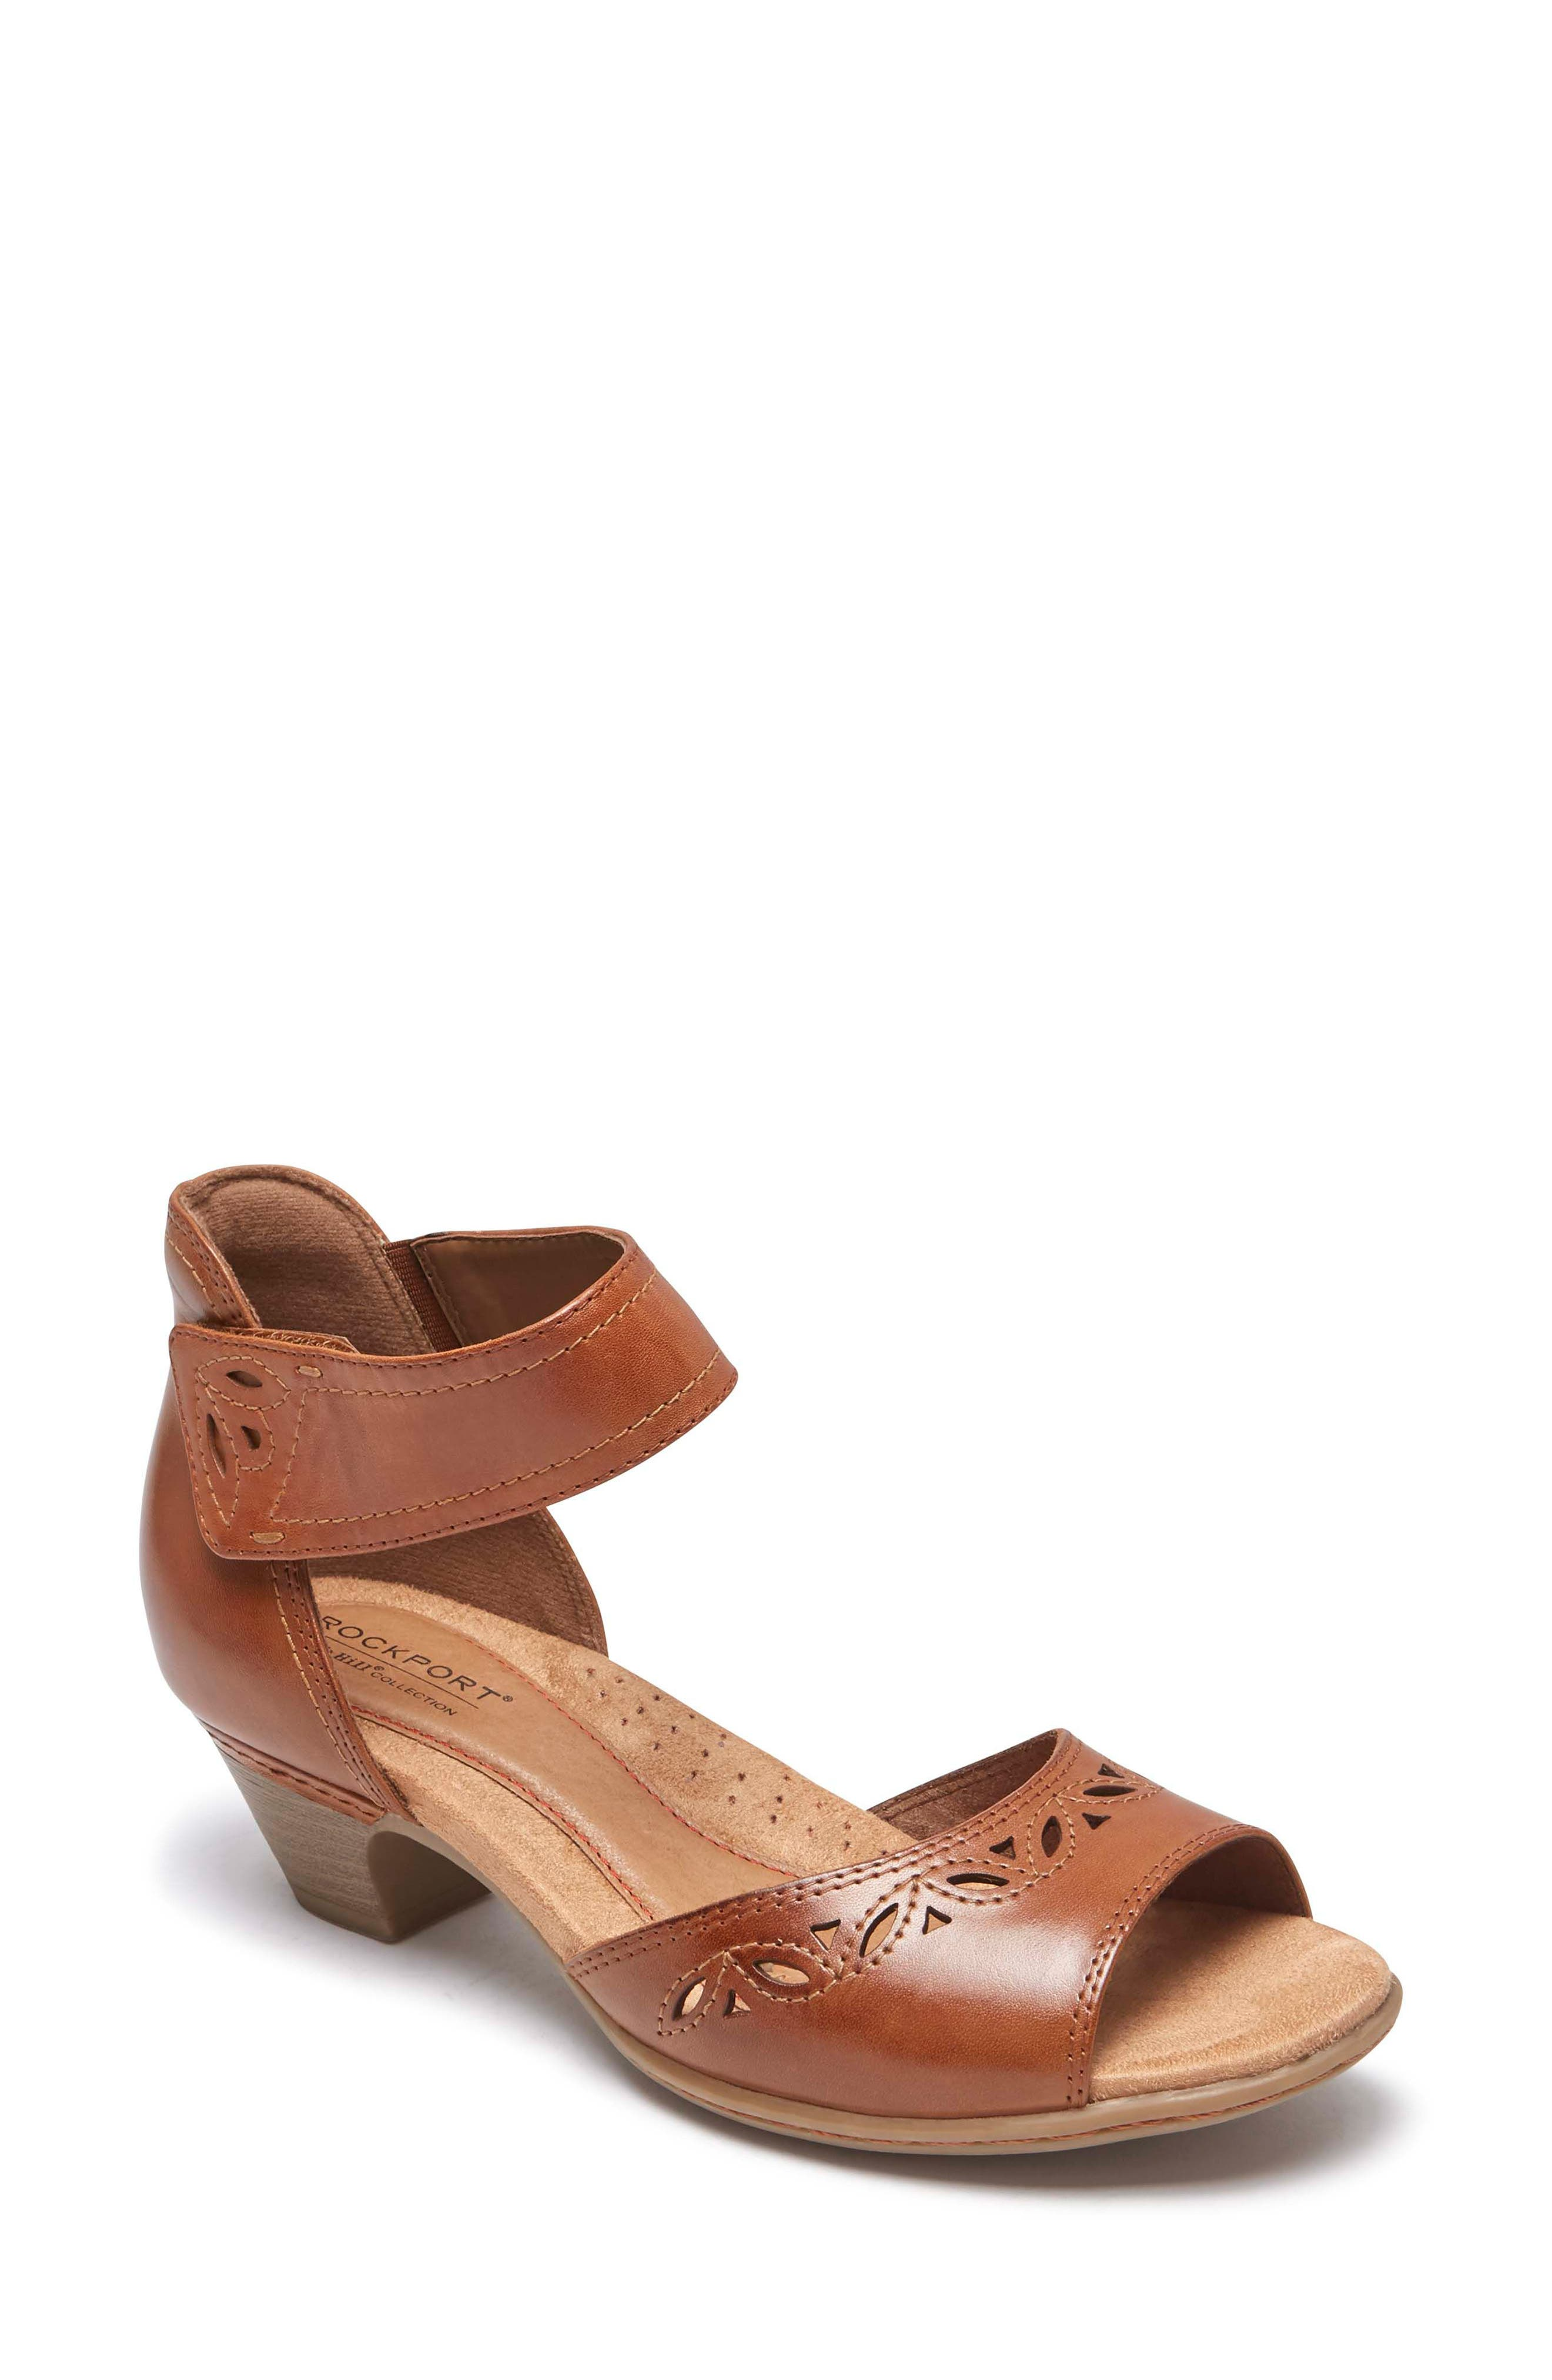 Abbott Perforated Sandal,                             Main thumbnail 1, color,                             Tan Leather